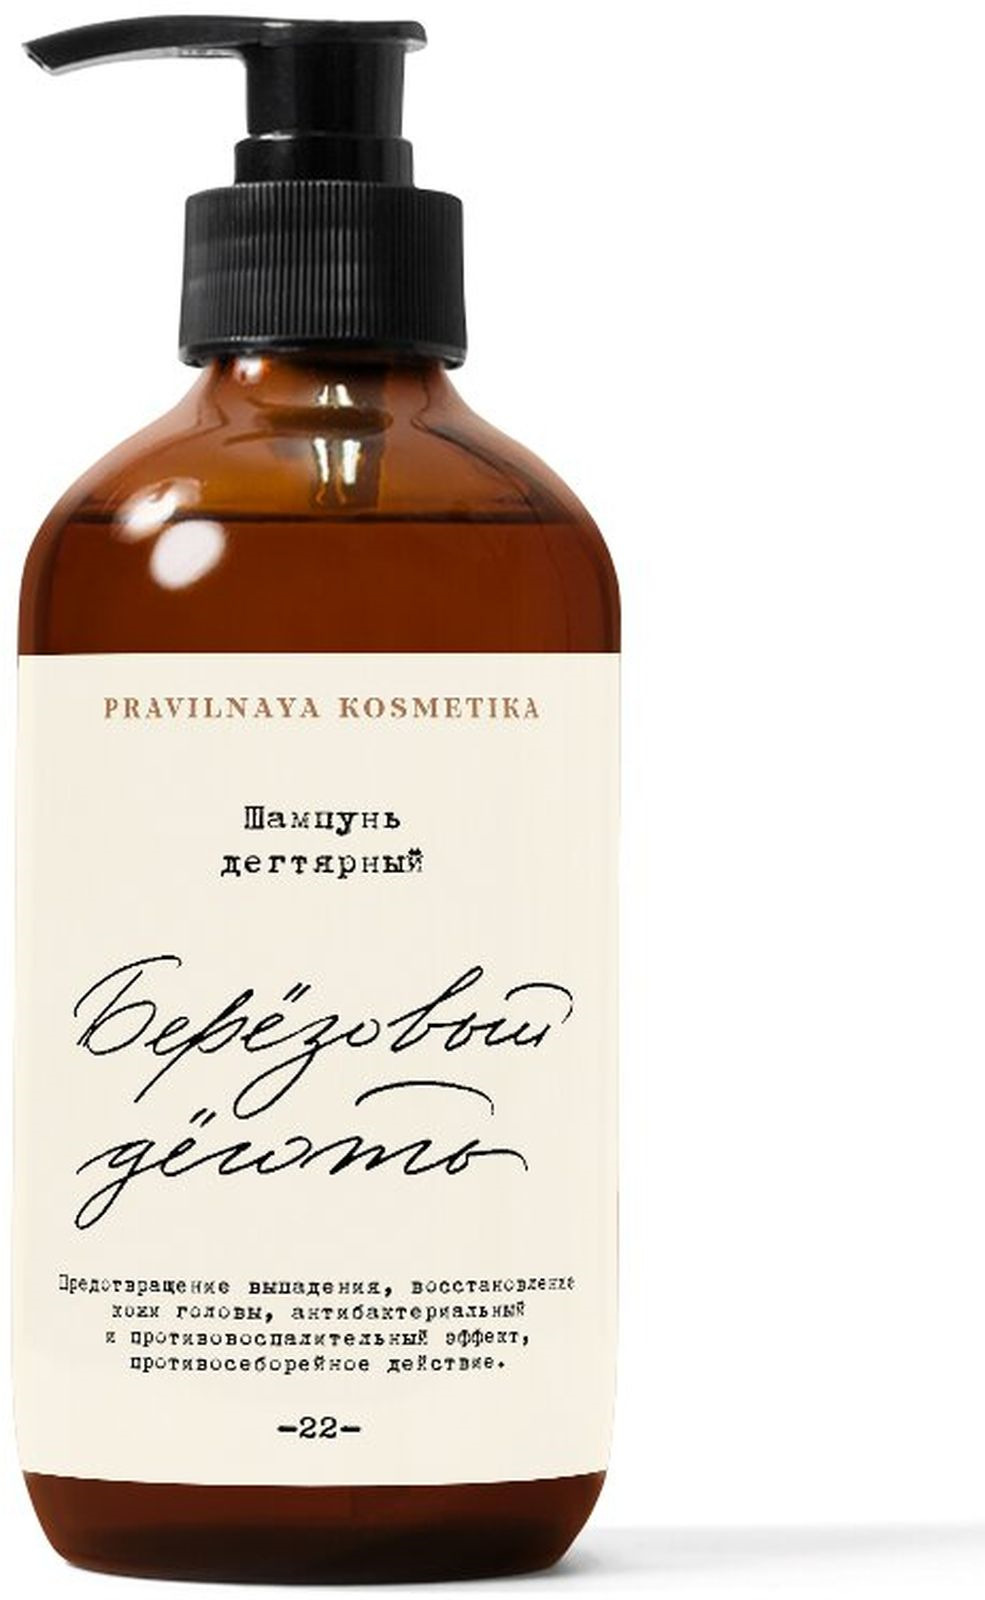 Шампунь для волос Pravilnaya Kosmetika Березовый Деготь, 250 мл деготь березовый 40мл